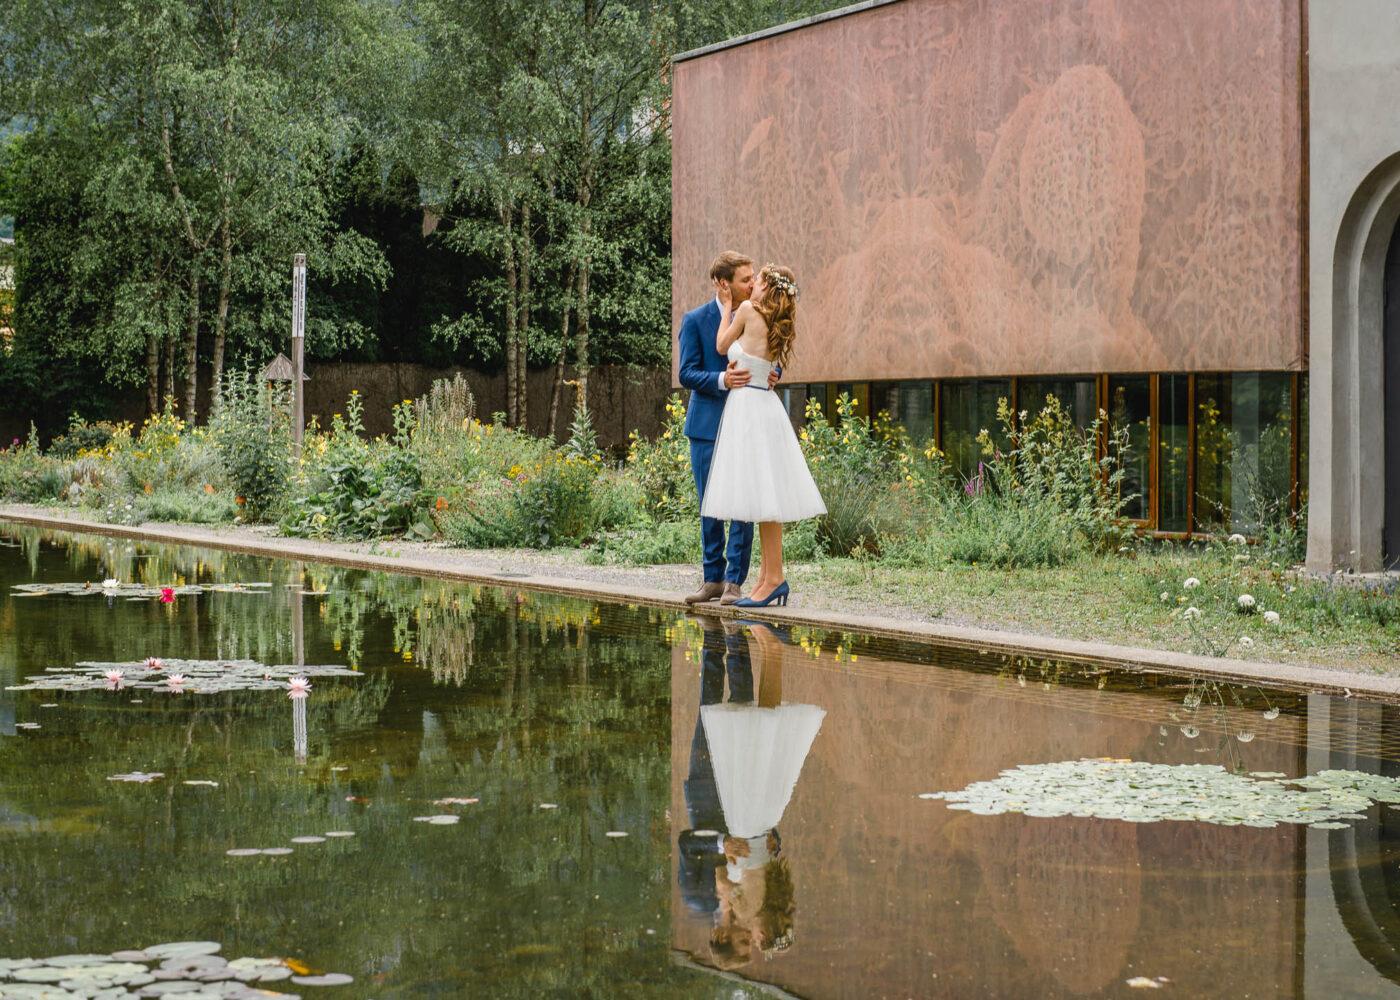 Hochzeitsfotograf Elfi Rasser 11i-photography